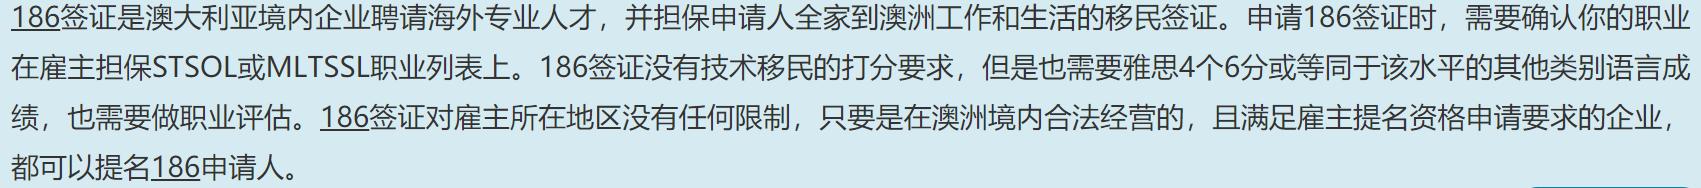 WeChat Image_20180605111523